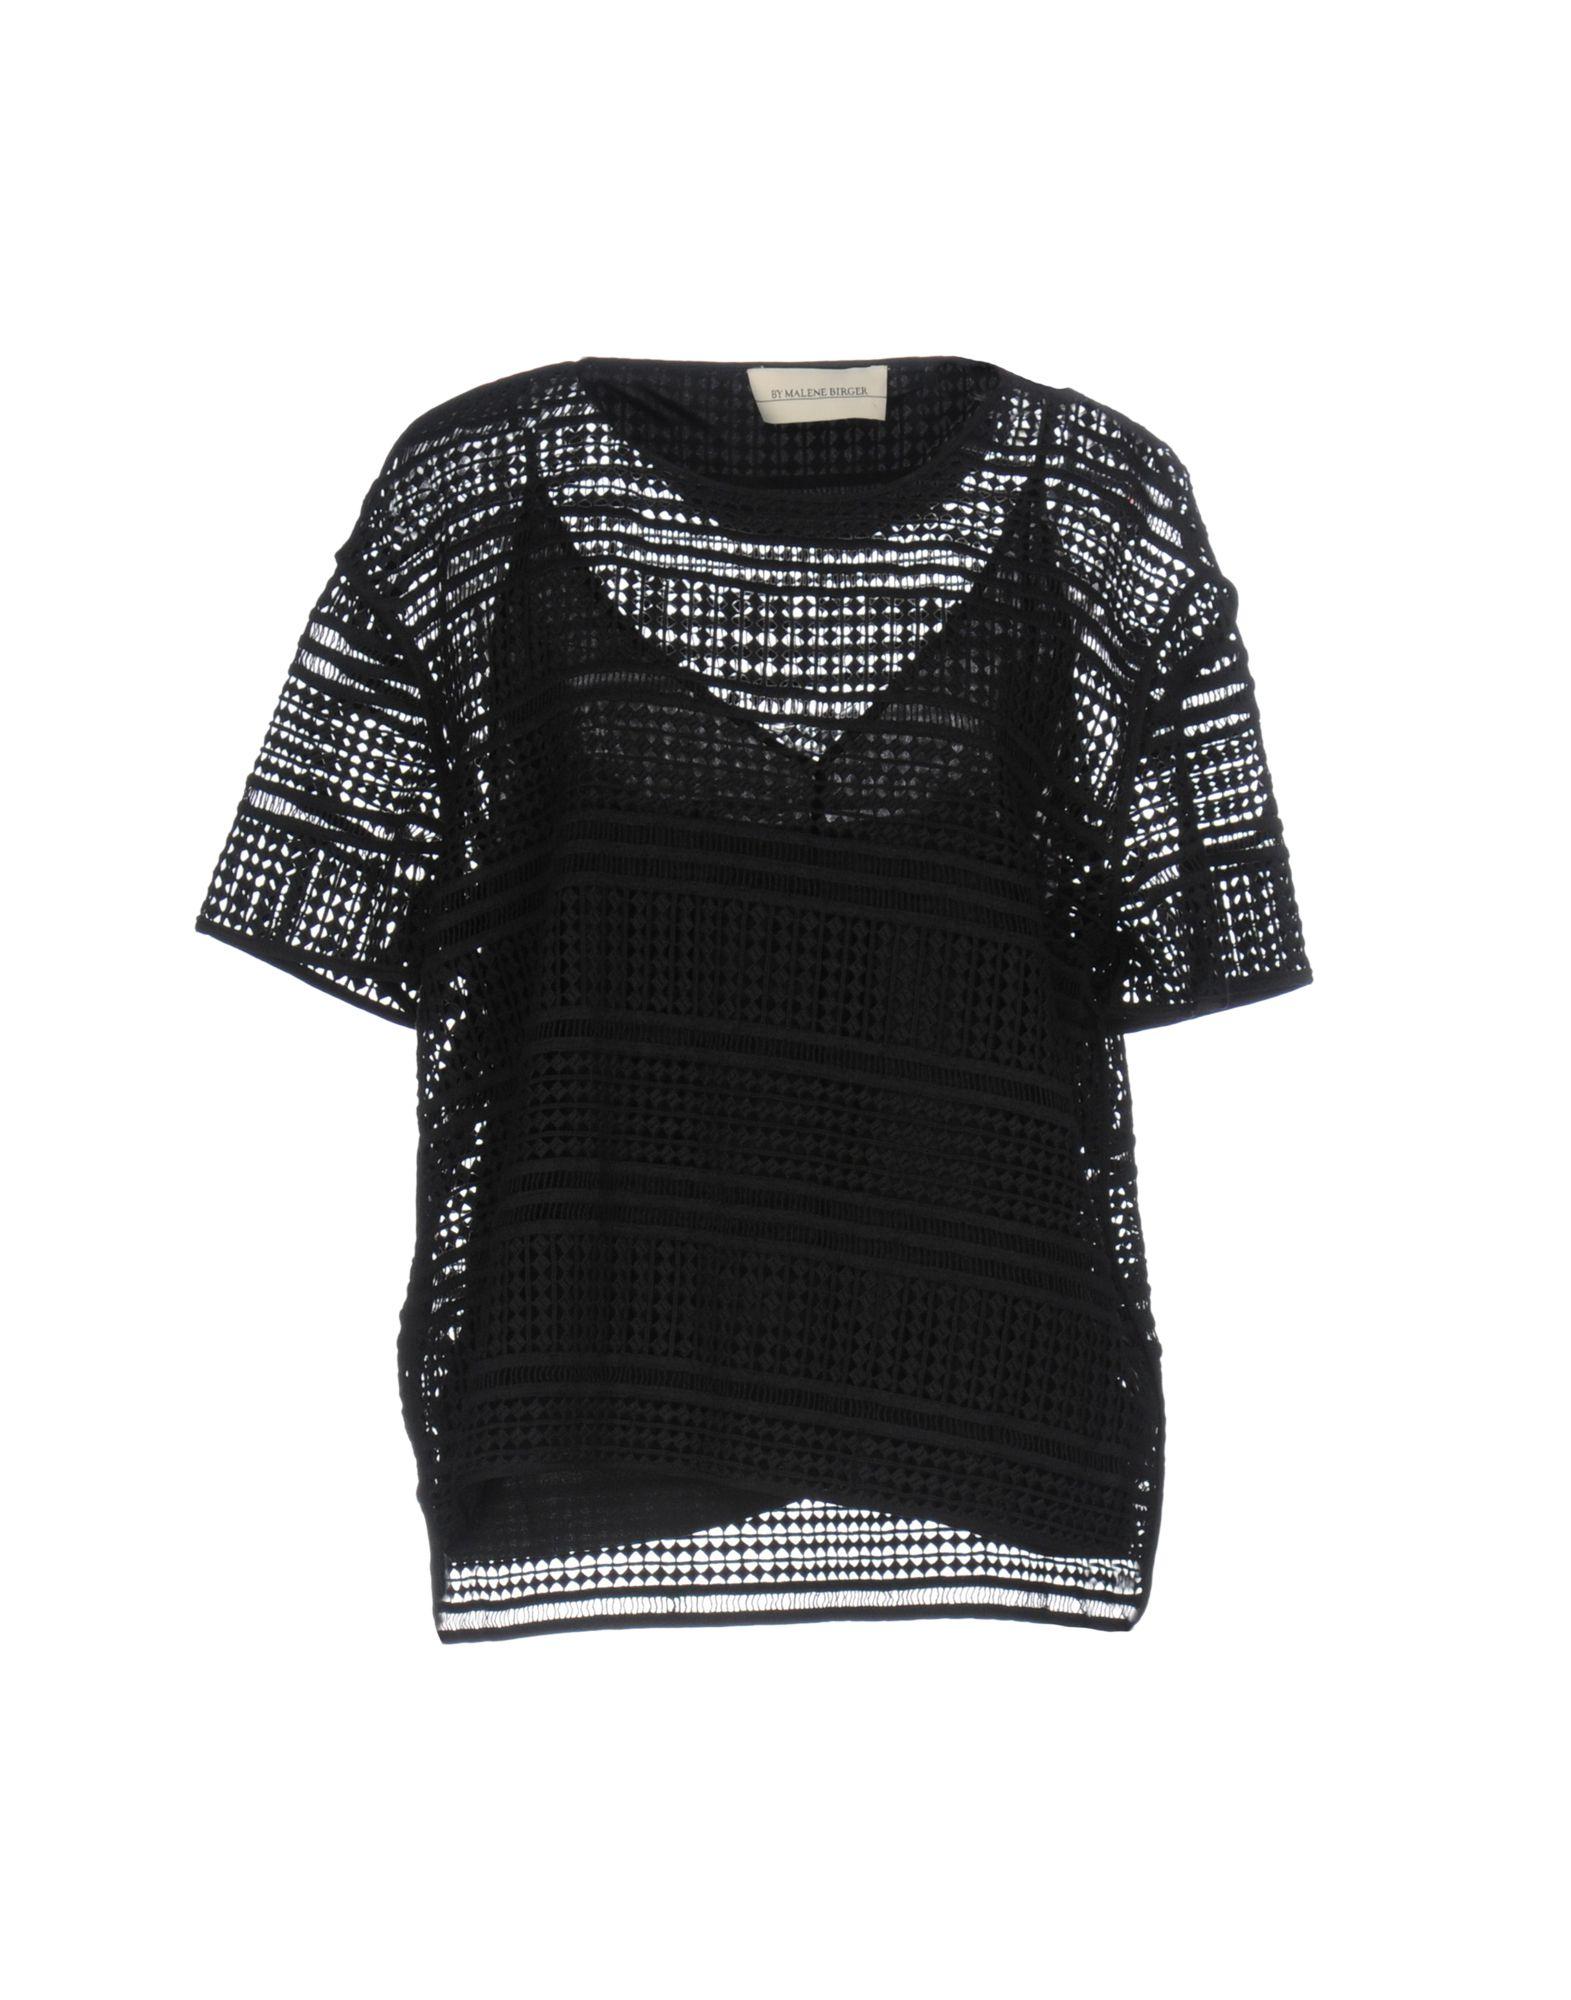 купить BY MALENE BIRGER Блузка по цене 7800 рублей